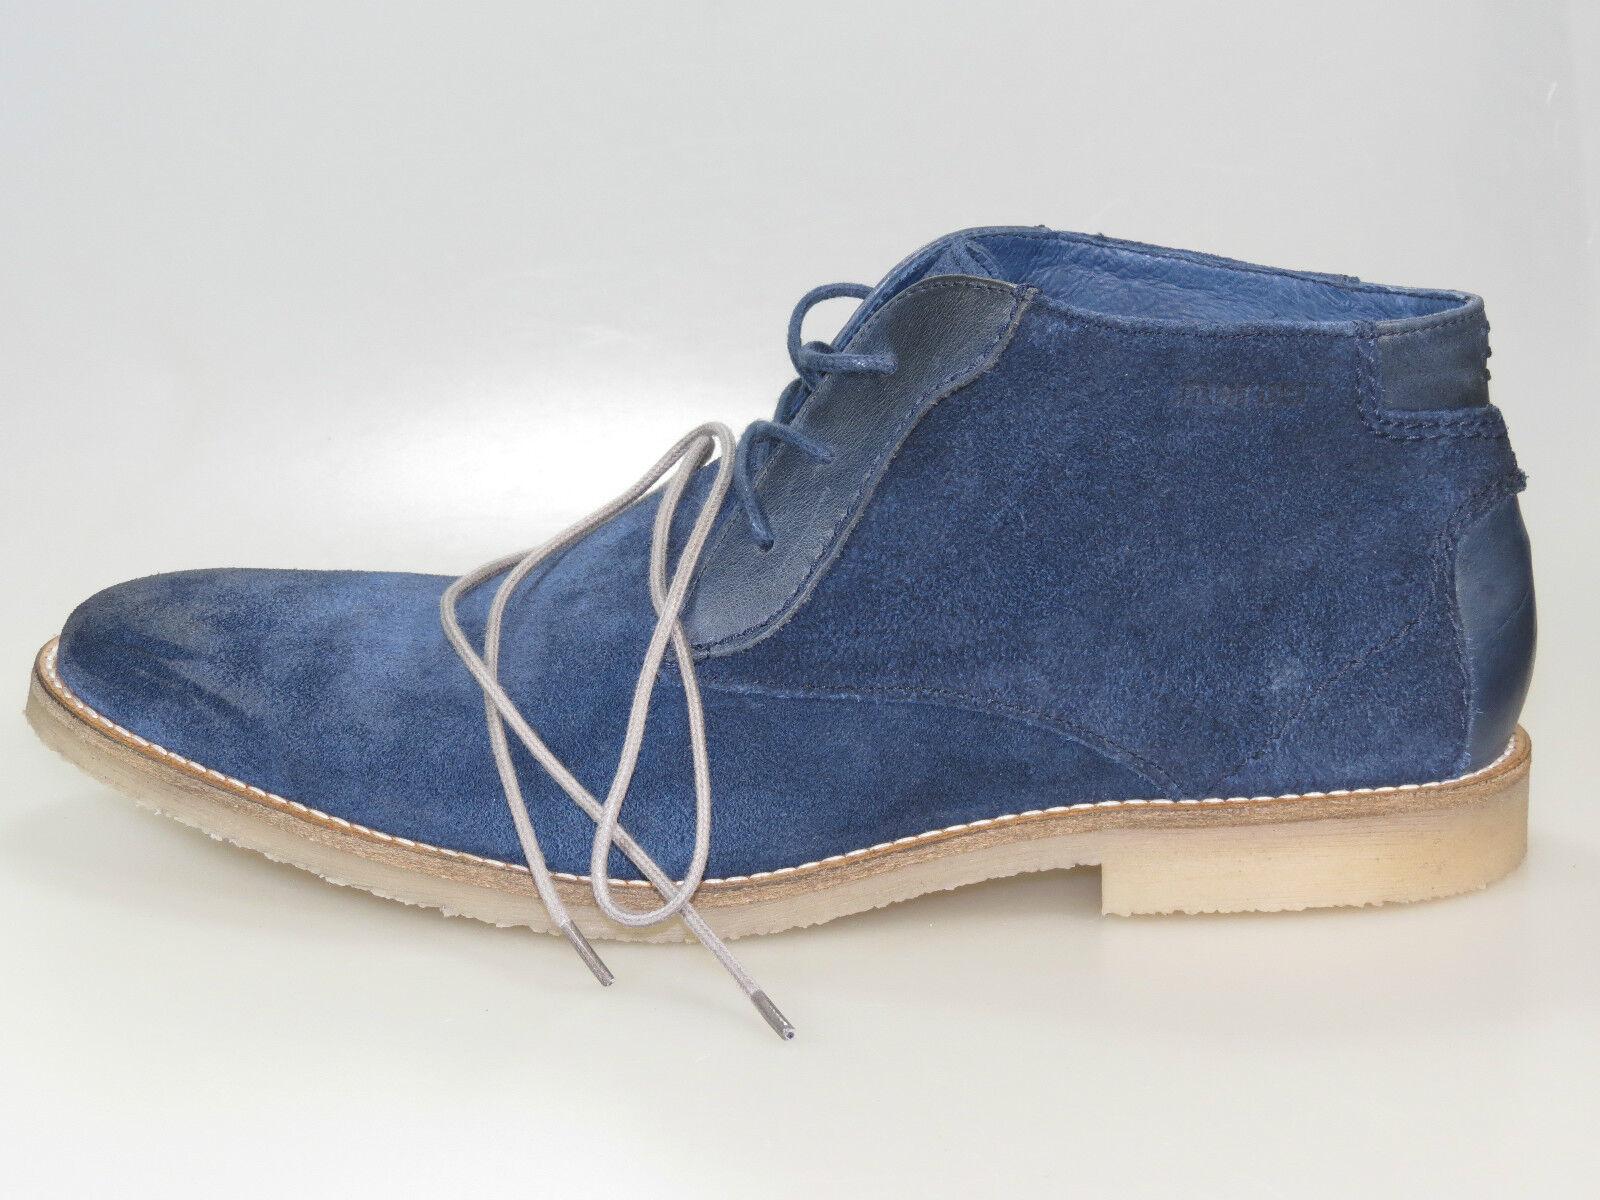 Maruti Stiefel Ponzio Men 66.20111.1071 Blau suede Leder +NEU+